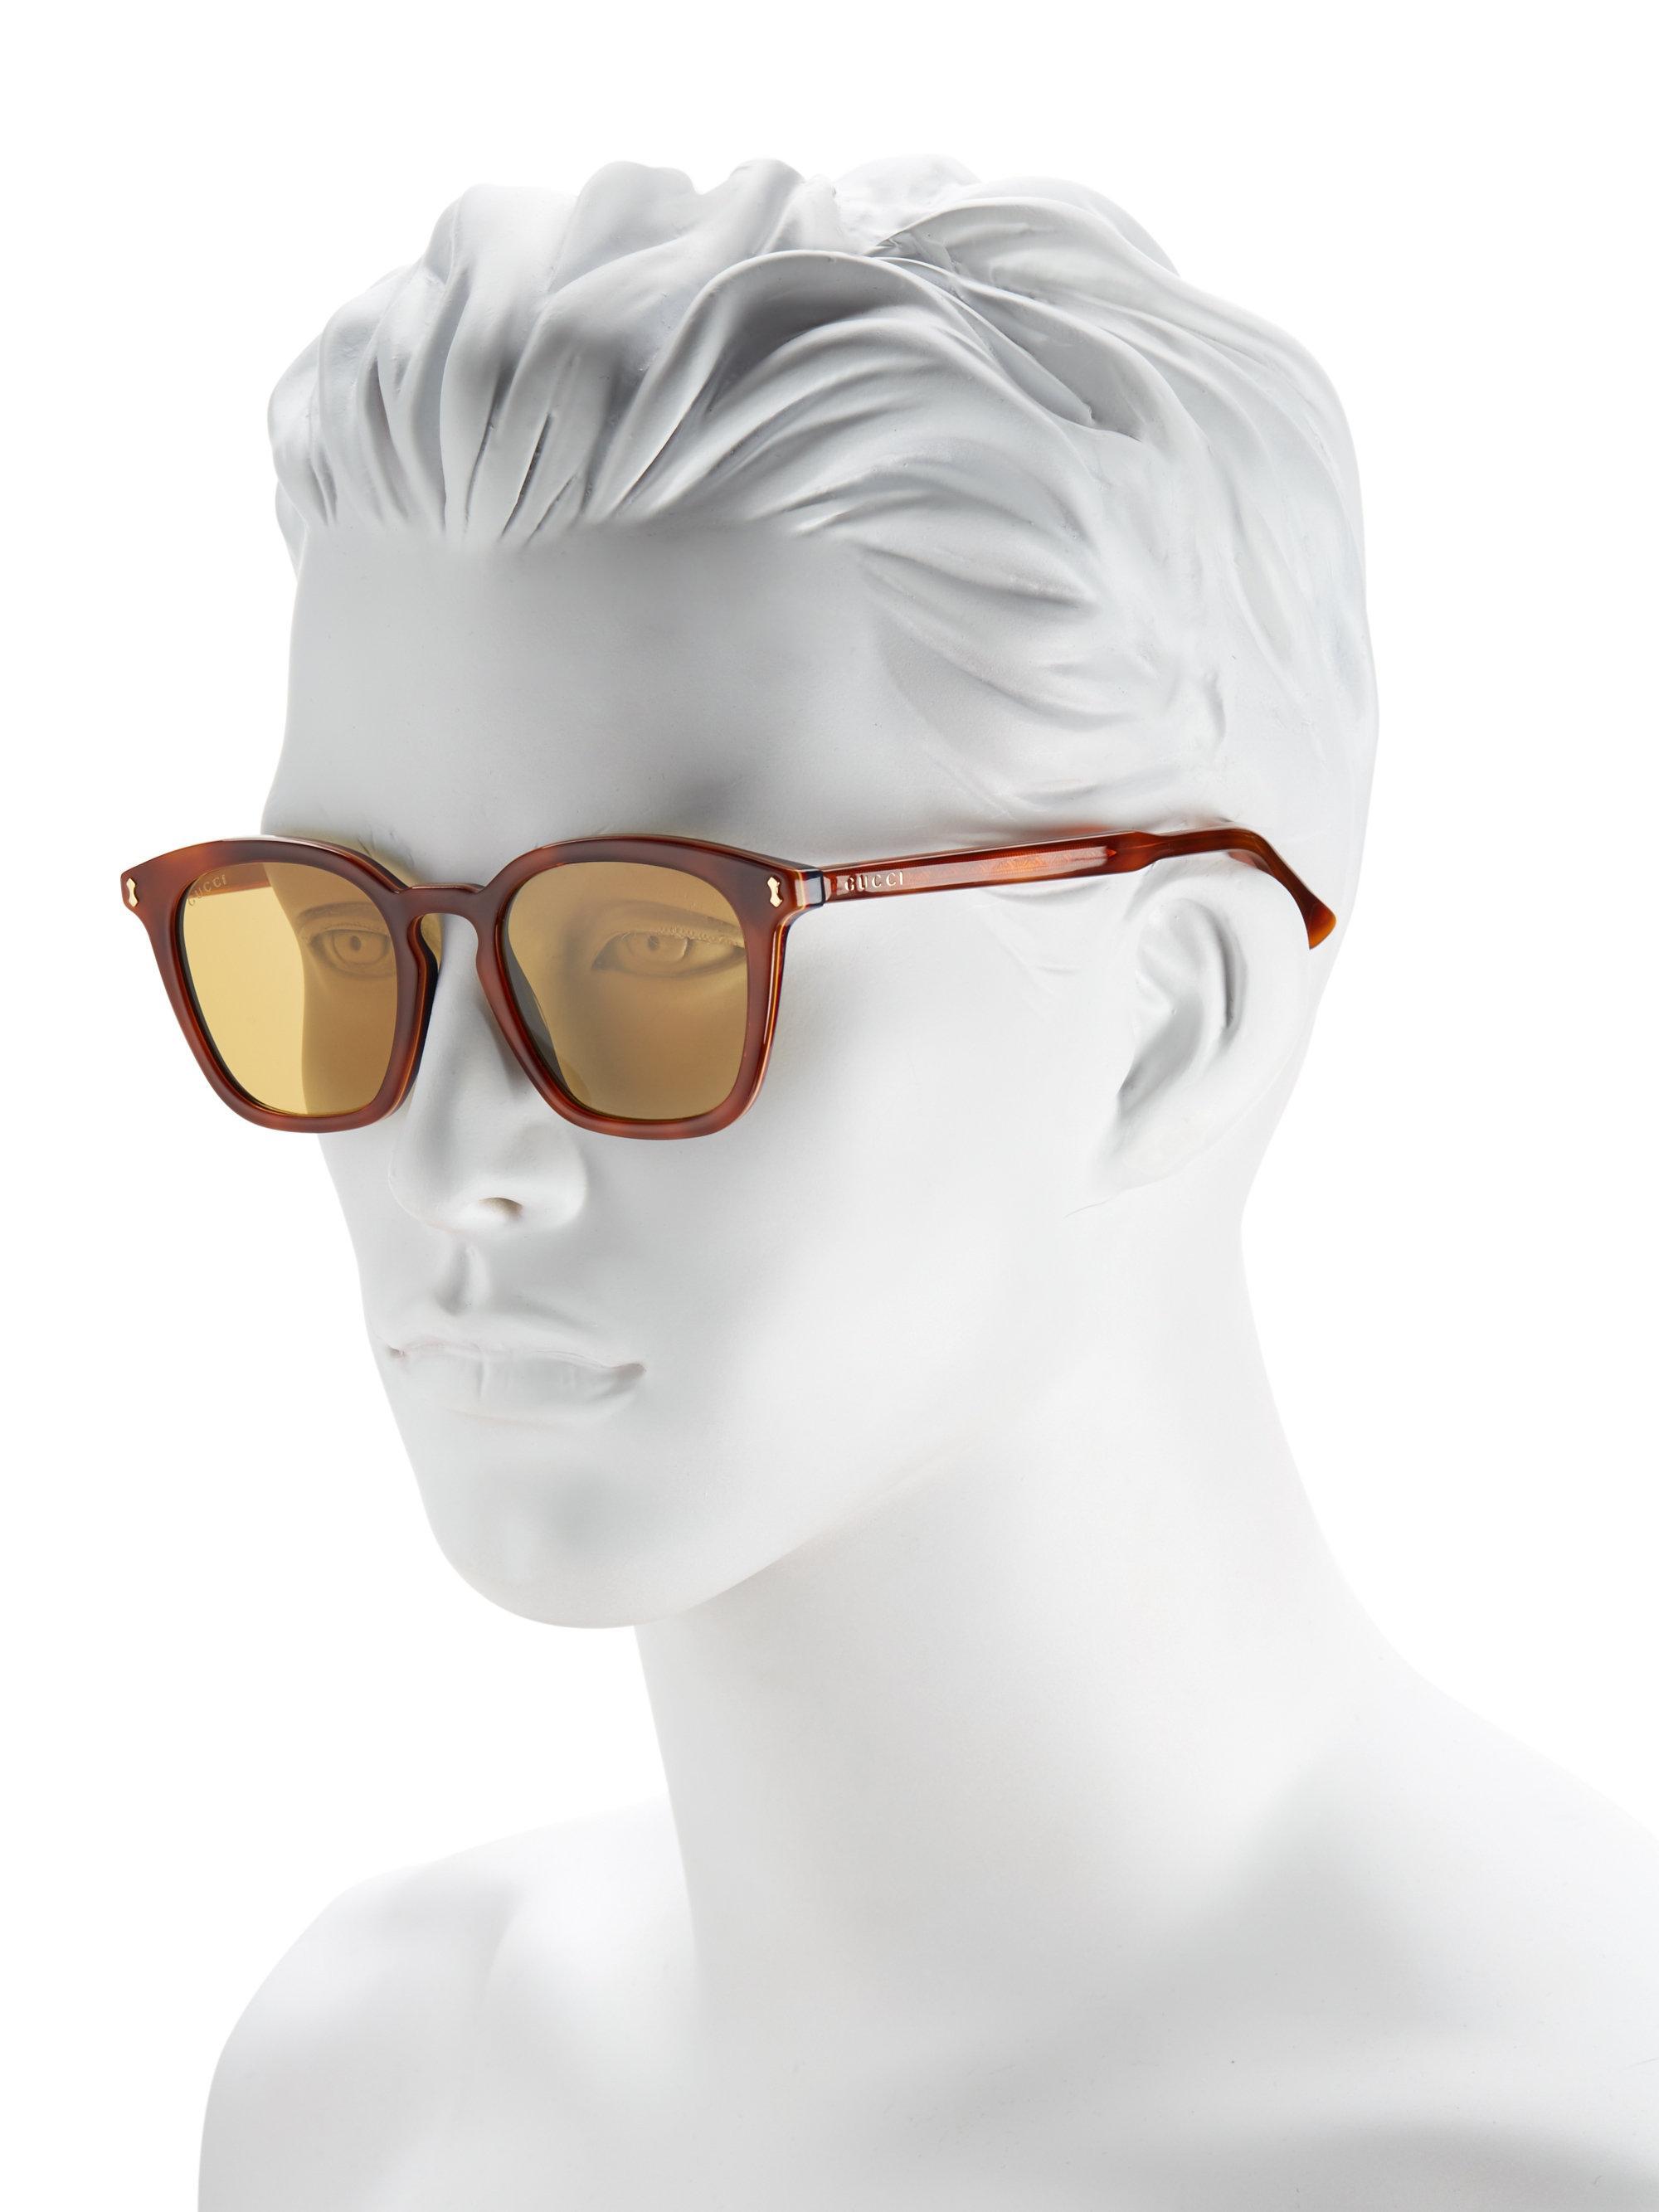 6c7825fb16d10 Gucci 49mm Square Sunglasses for Men - Lyst